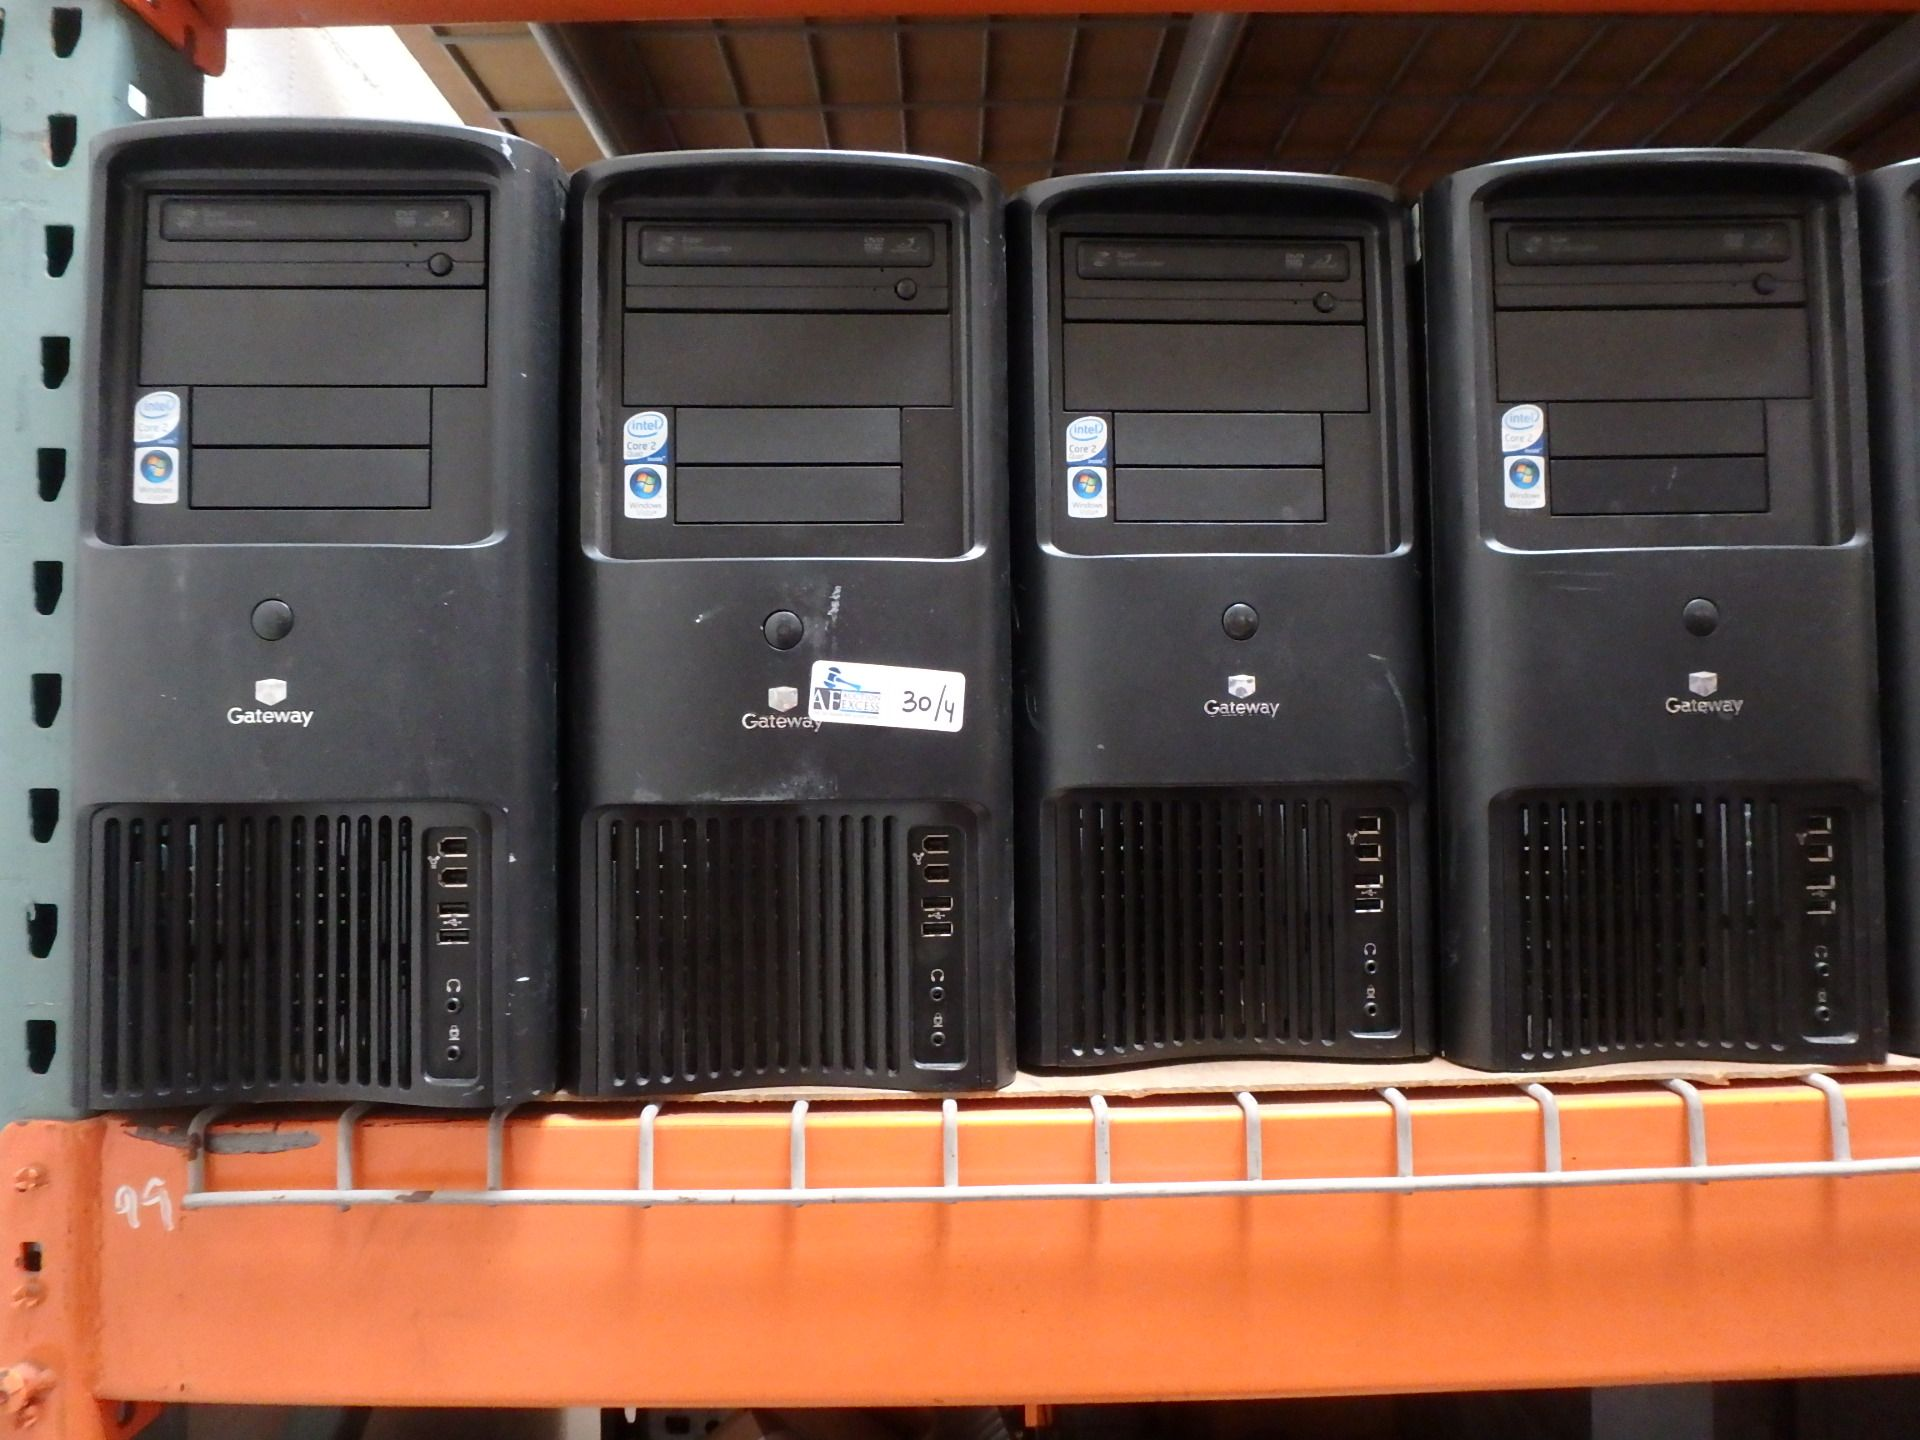 Lot 30 - LOT OF 4 GATEWAY COMPUTERS